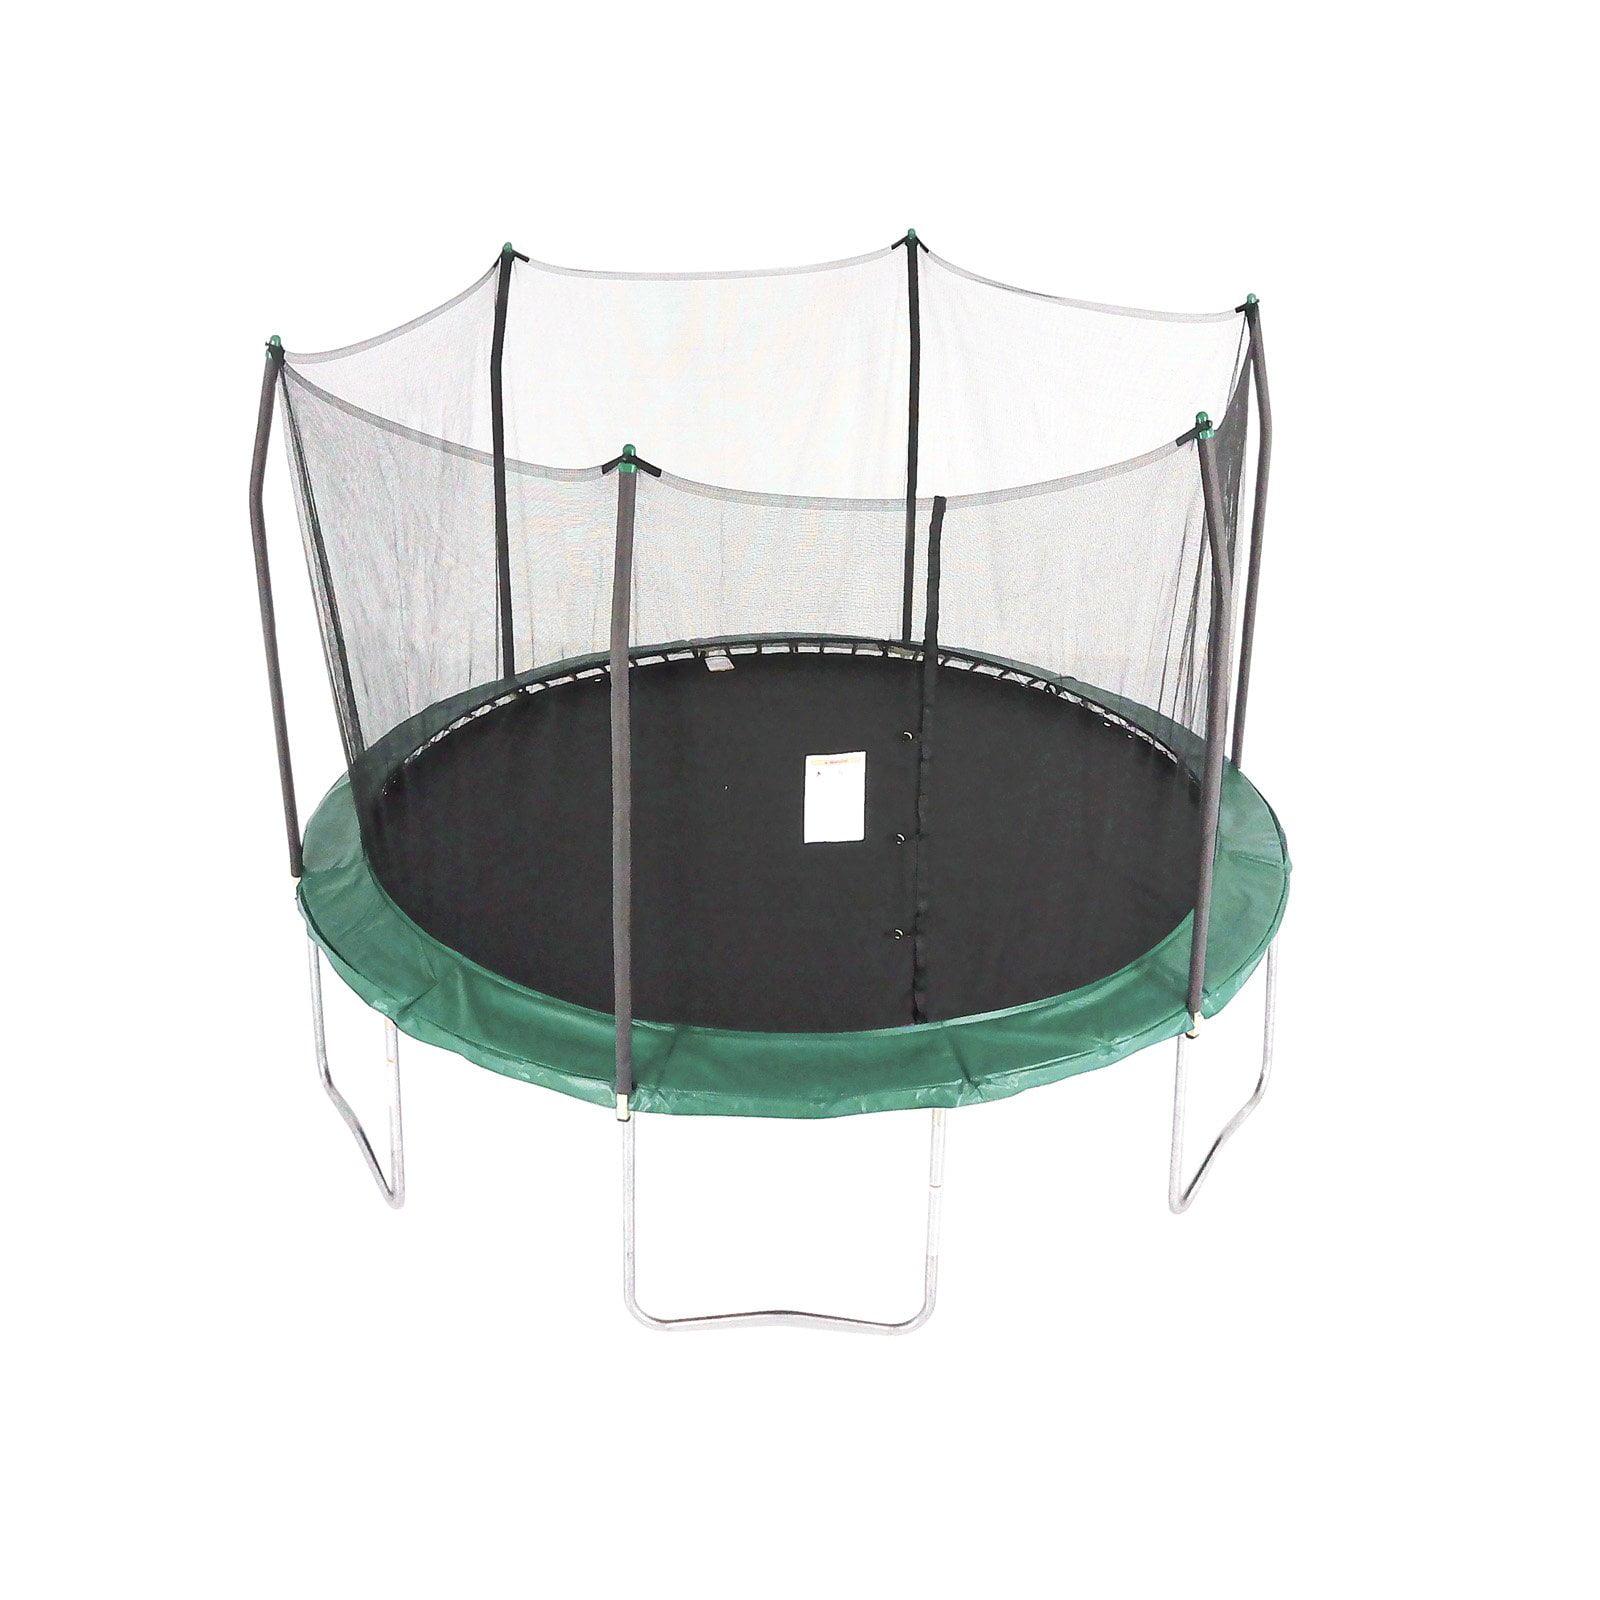 Skywalker 12-ft. Round Trampoline with Enclosure